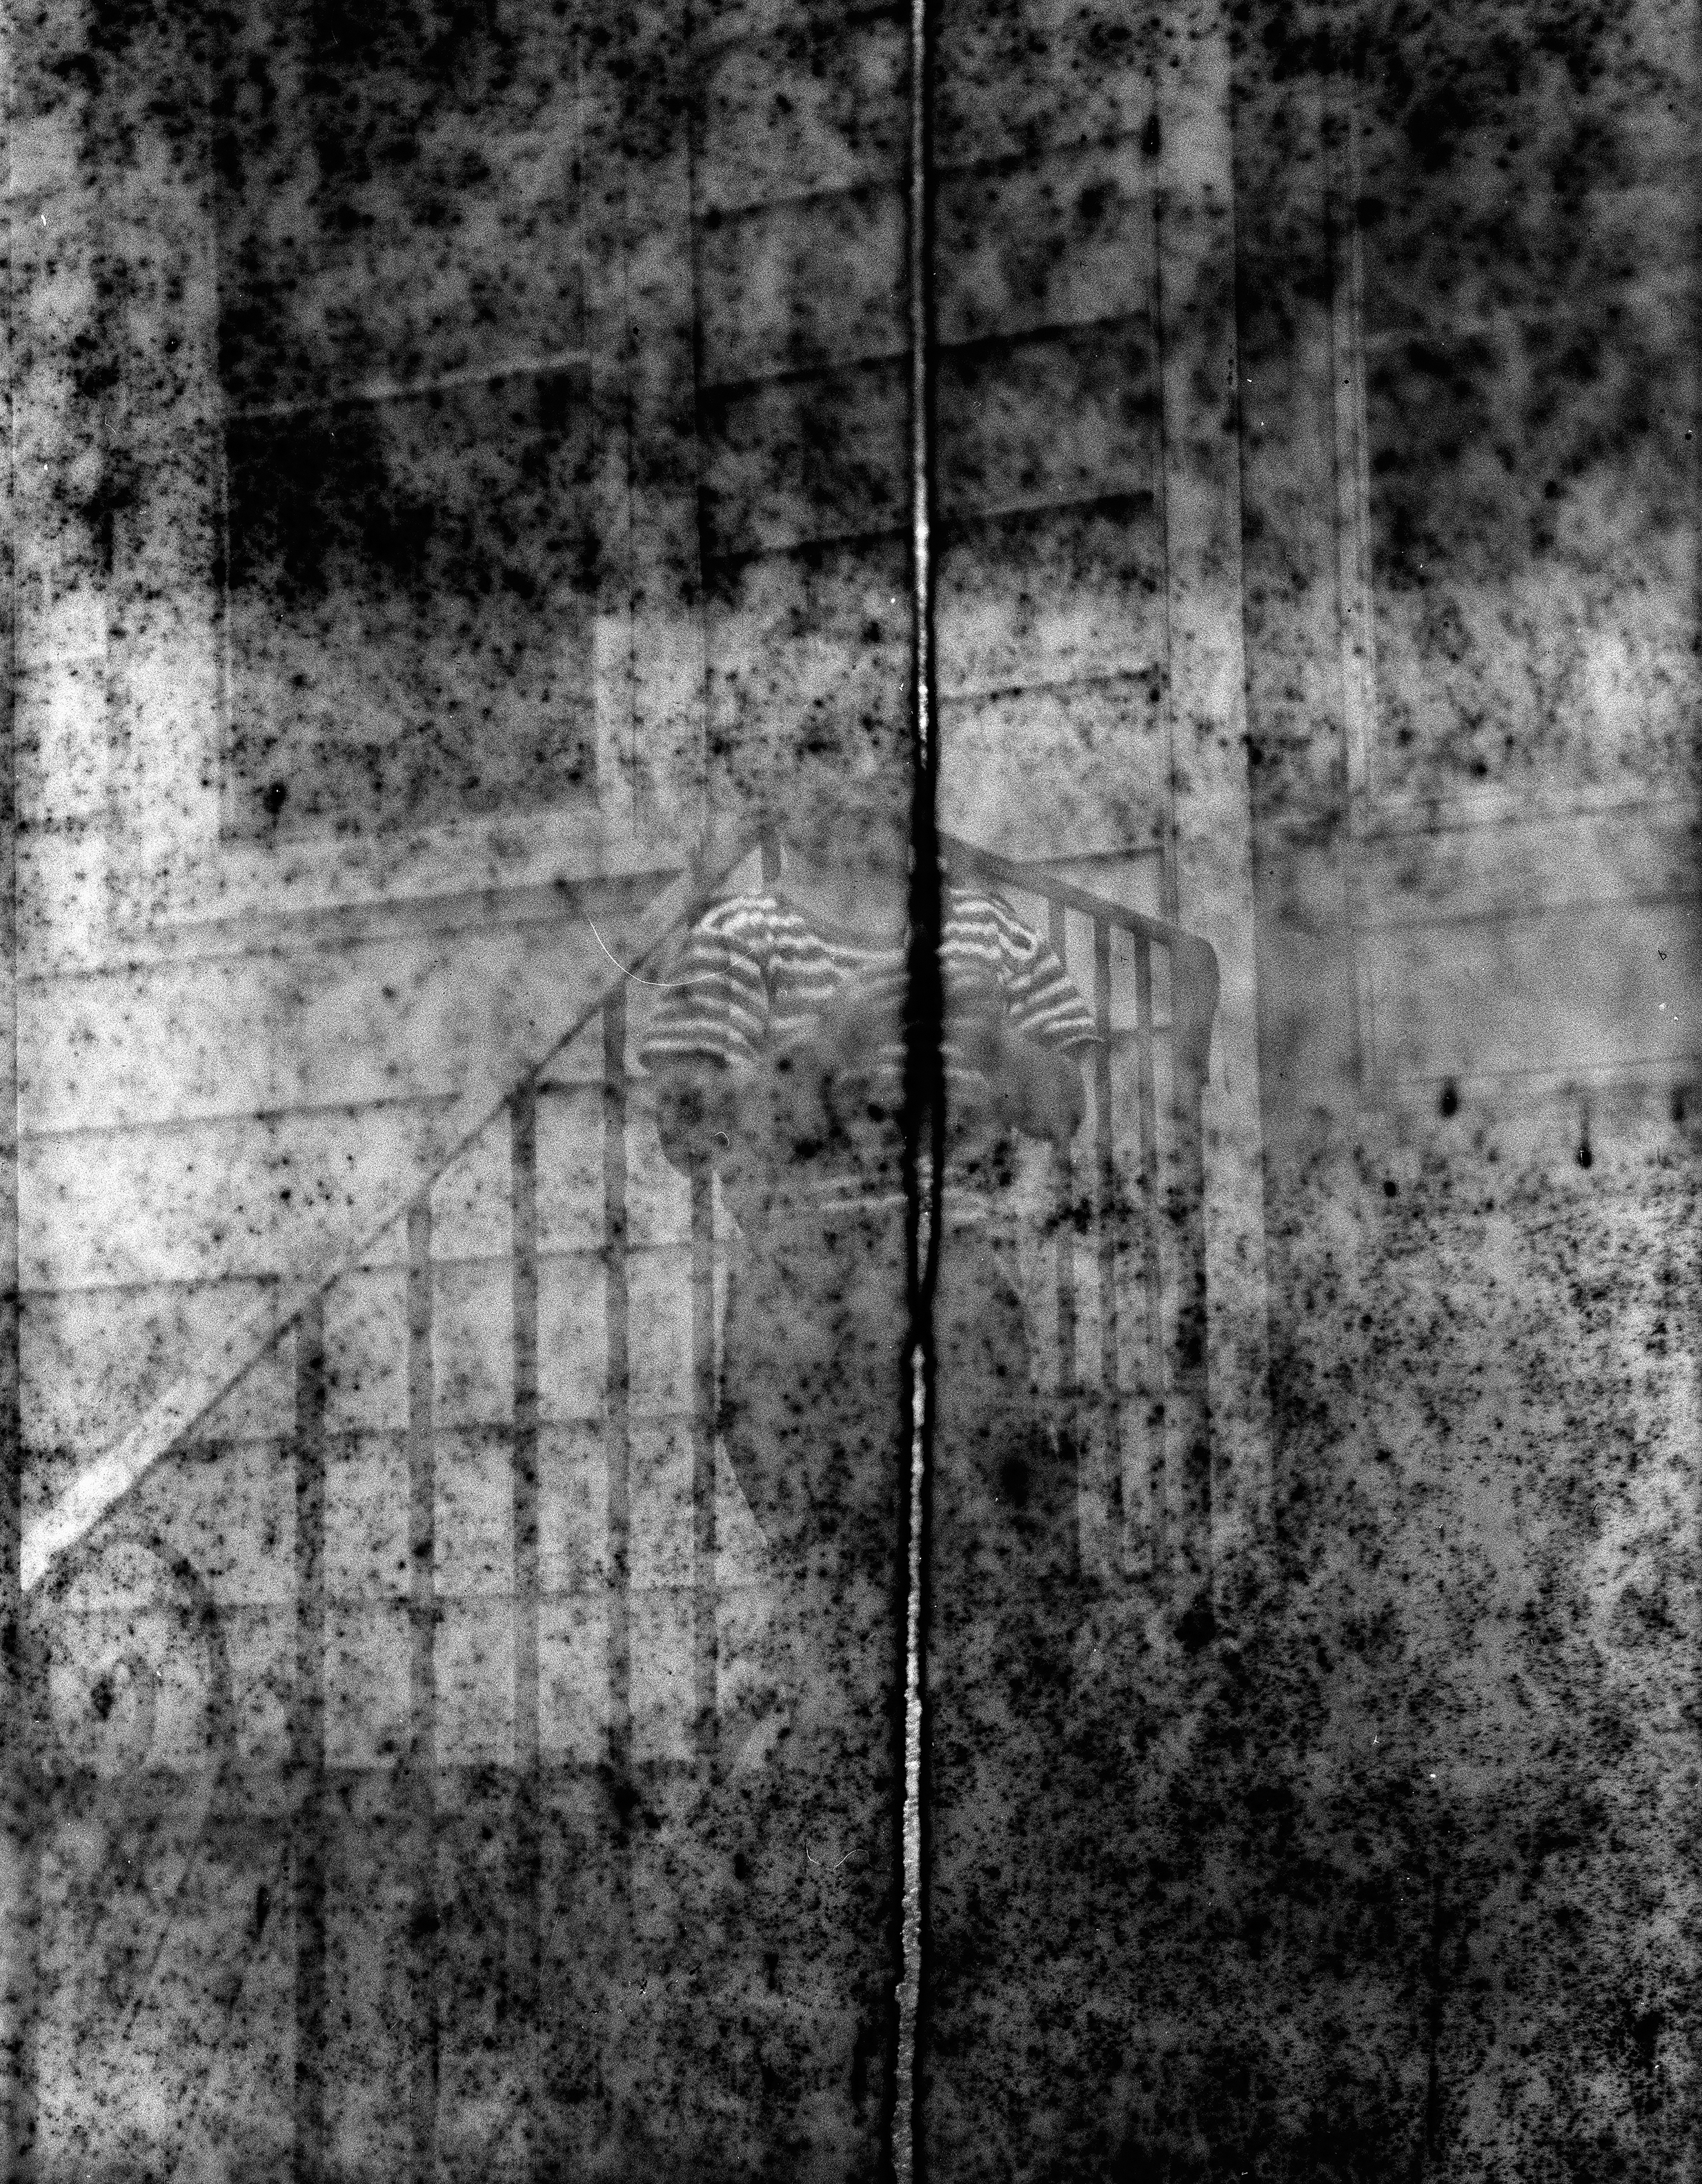 Paul Bundle 6 Roll 13 001.jpg